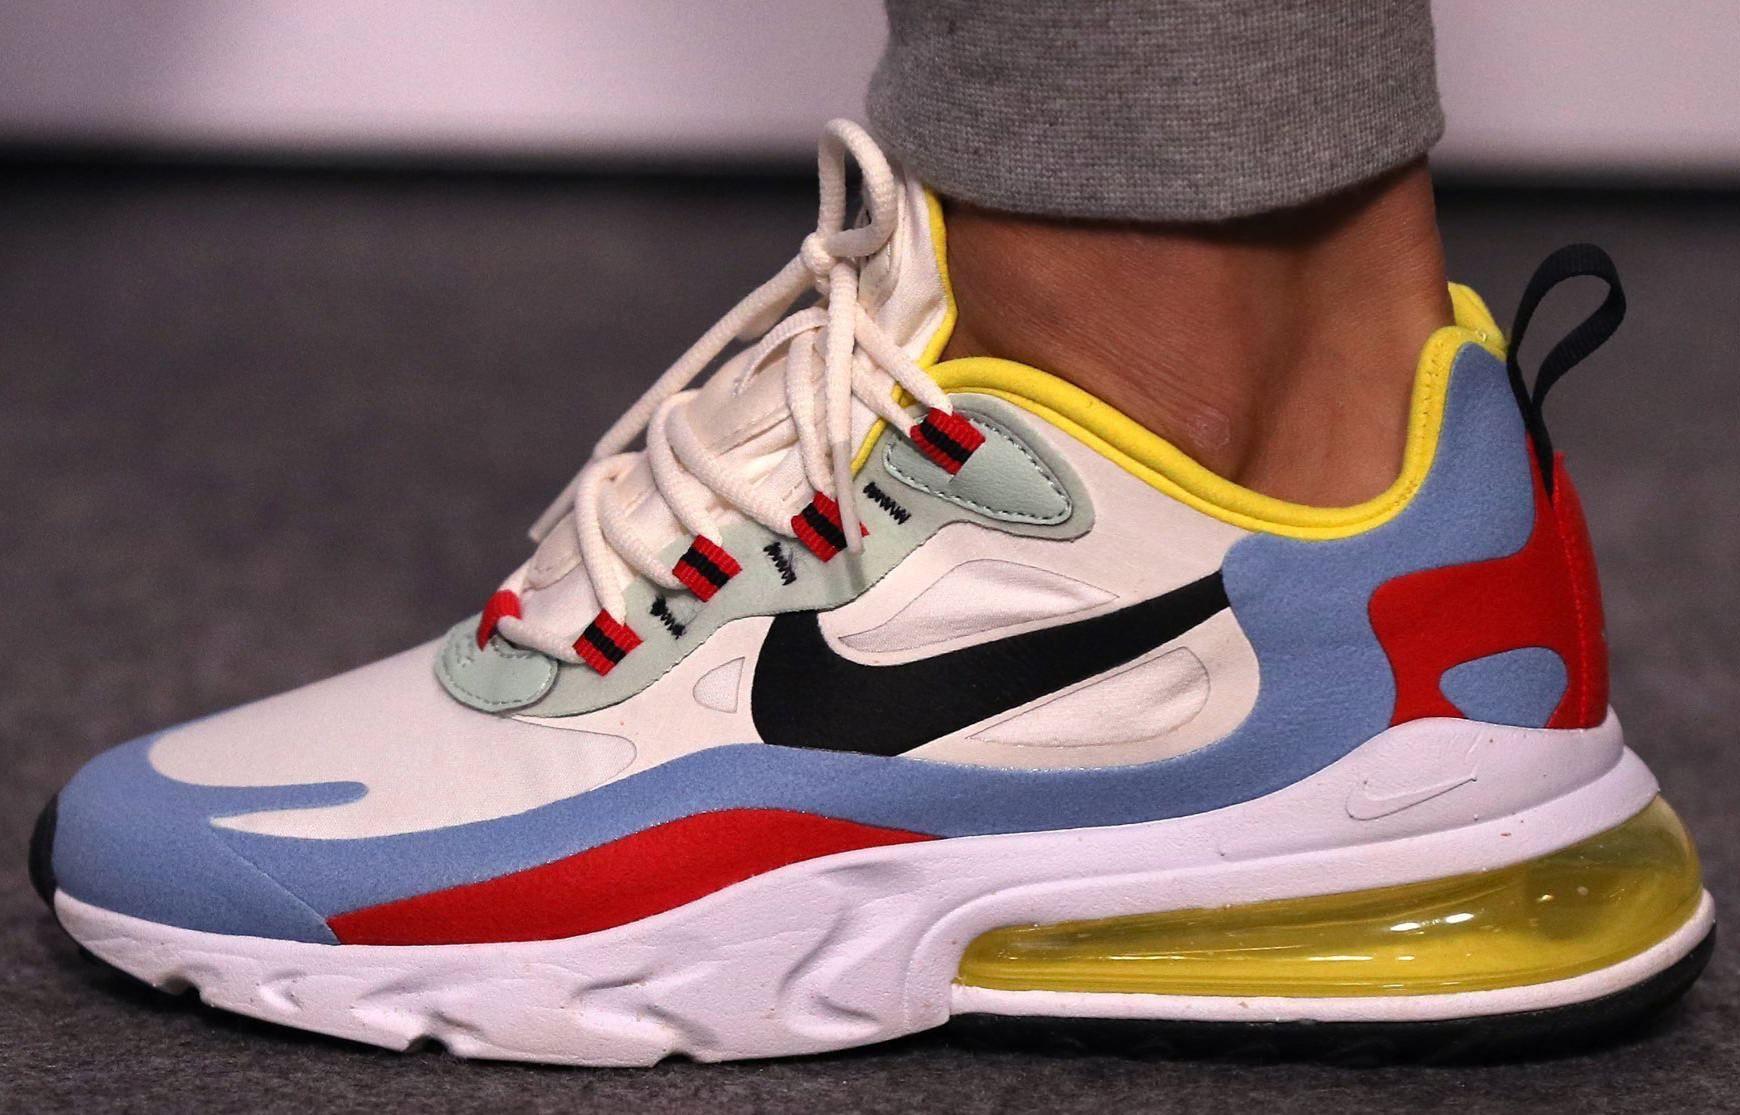 Nike Air Max 270 React | Nike shoes air max, Nike shoes